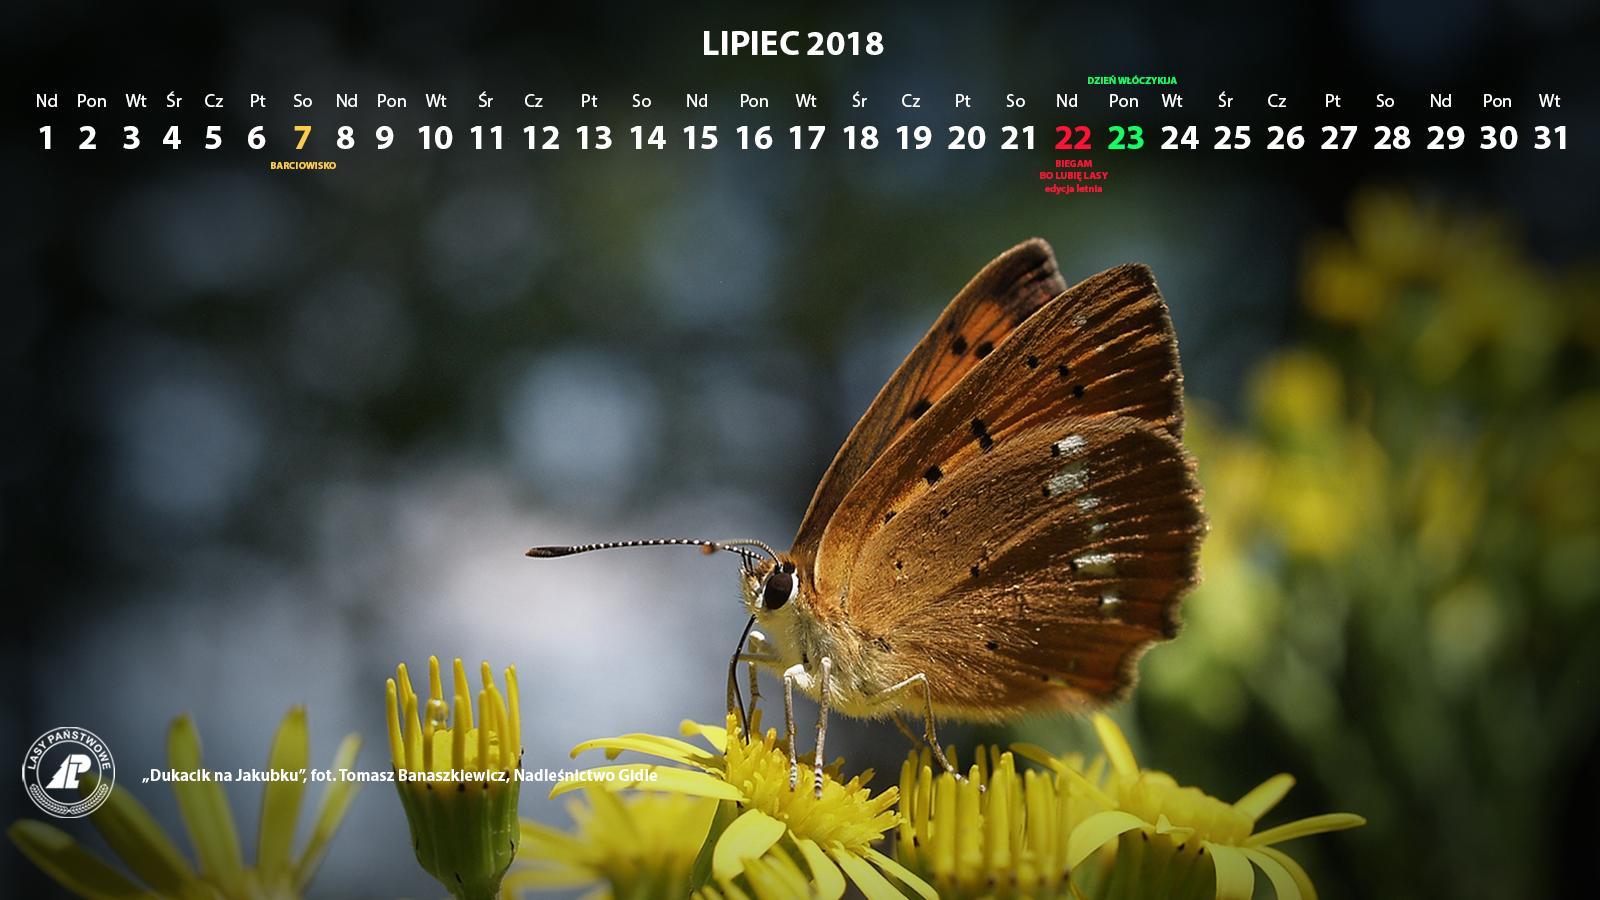 Kalendarz_lipiec_2018_1600x900[1].jpg